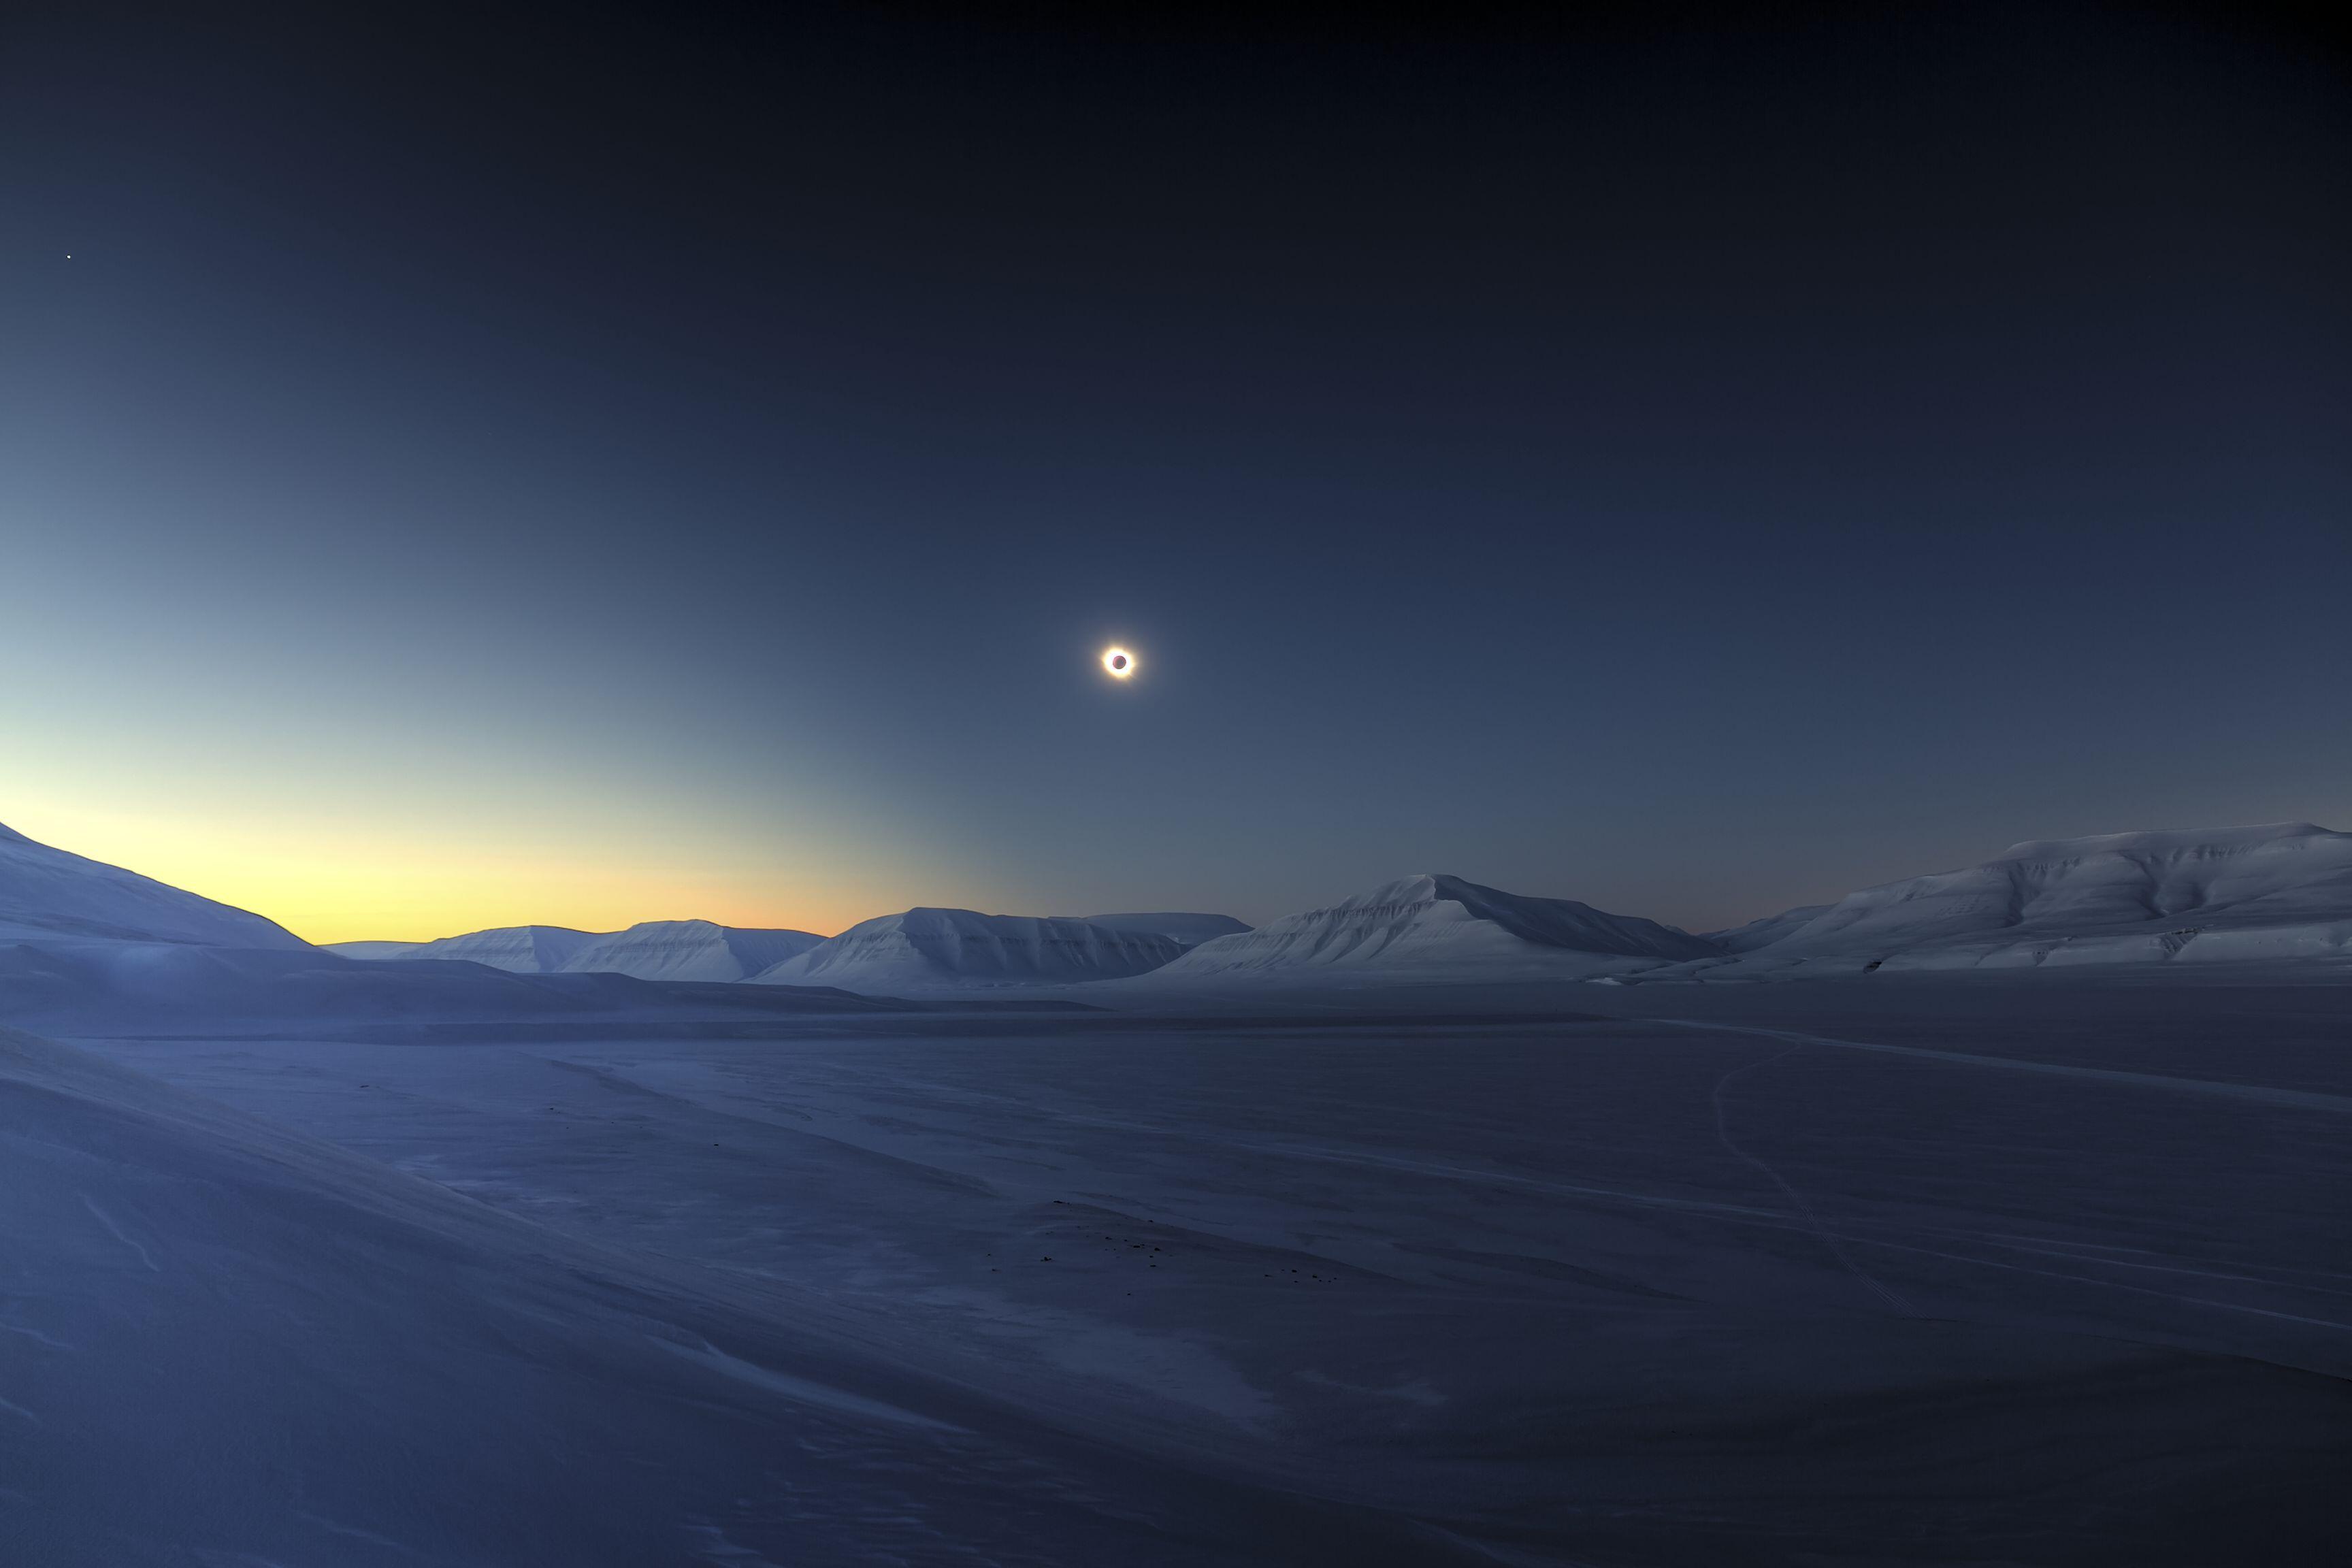 Bild zu Luc Jamet (France) with Eclipse Totality over Sassendalen